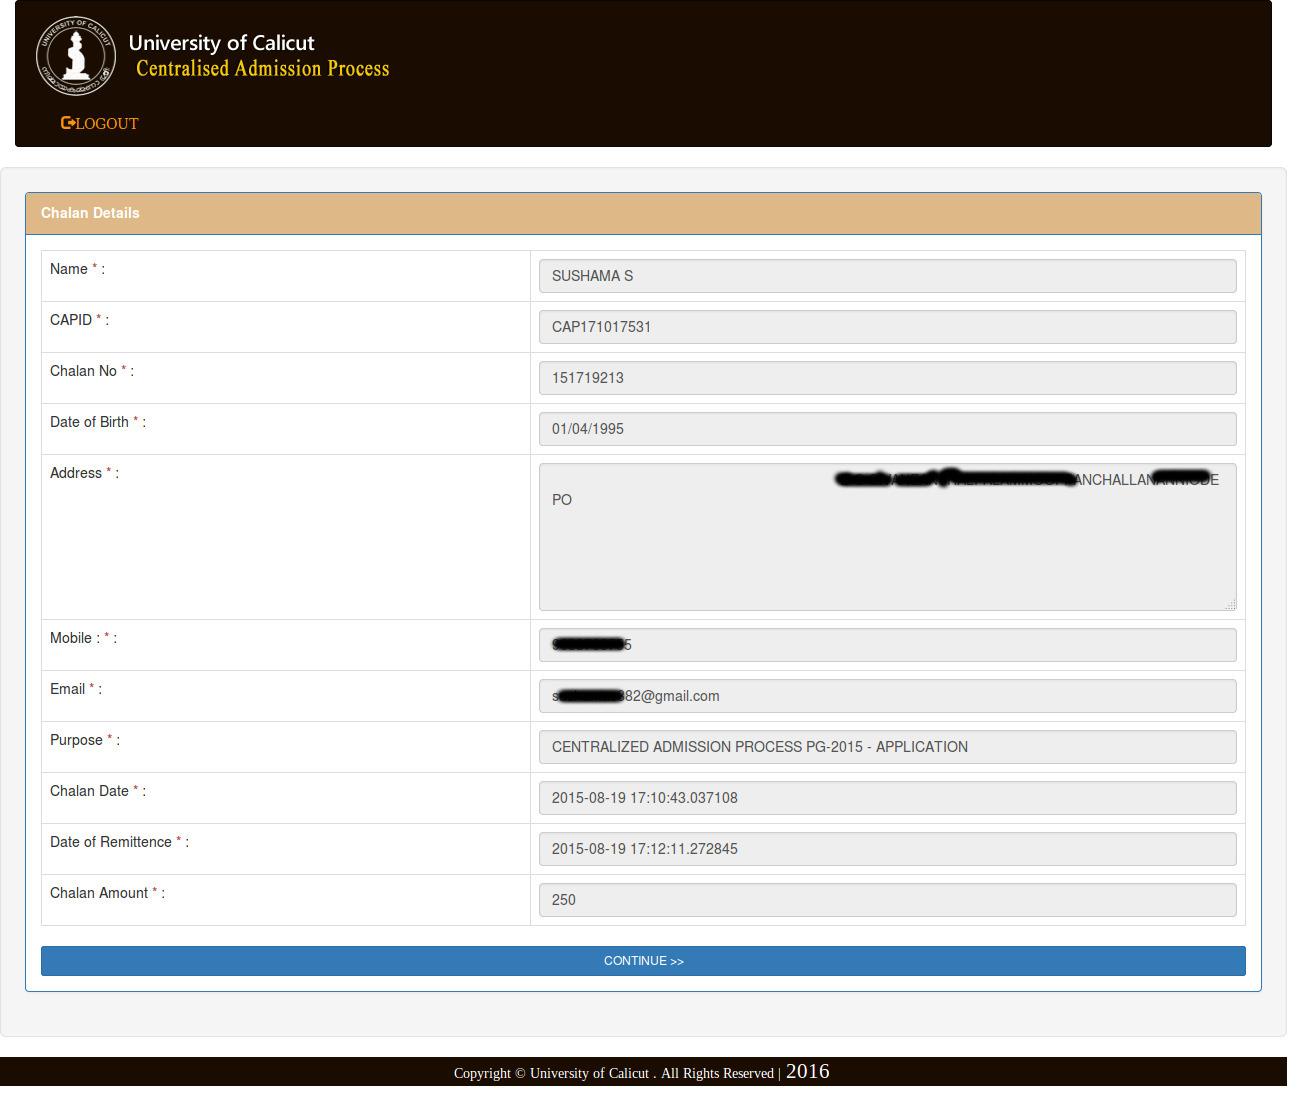 University of Calicut B.Ed Application Form 2017